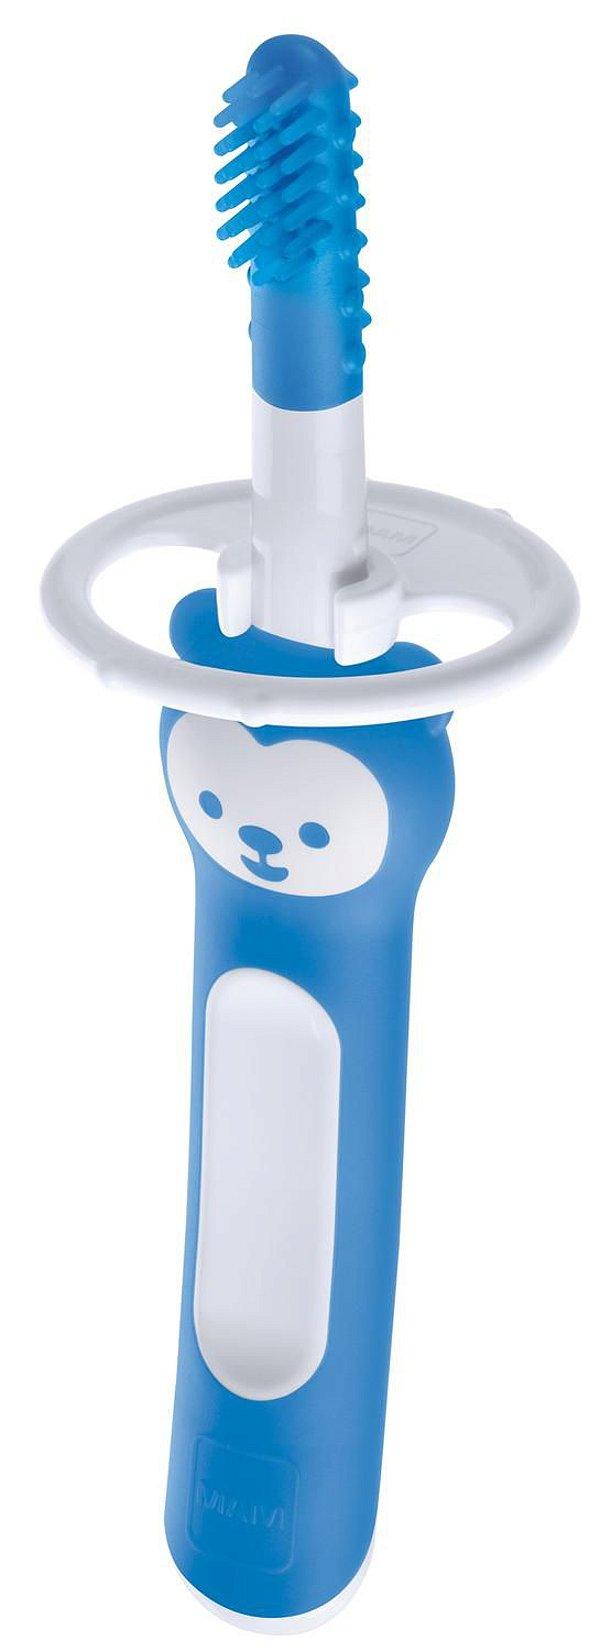 Massageador MAM Massaging Brush 3m+ Azul